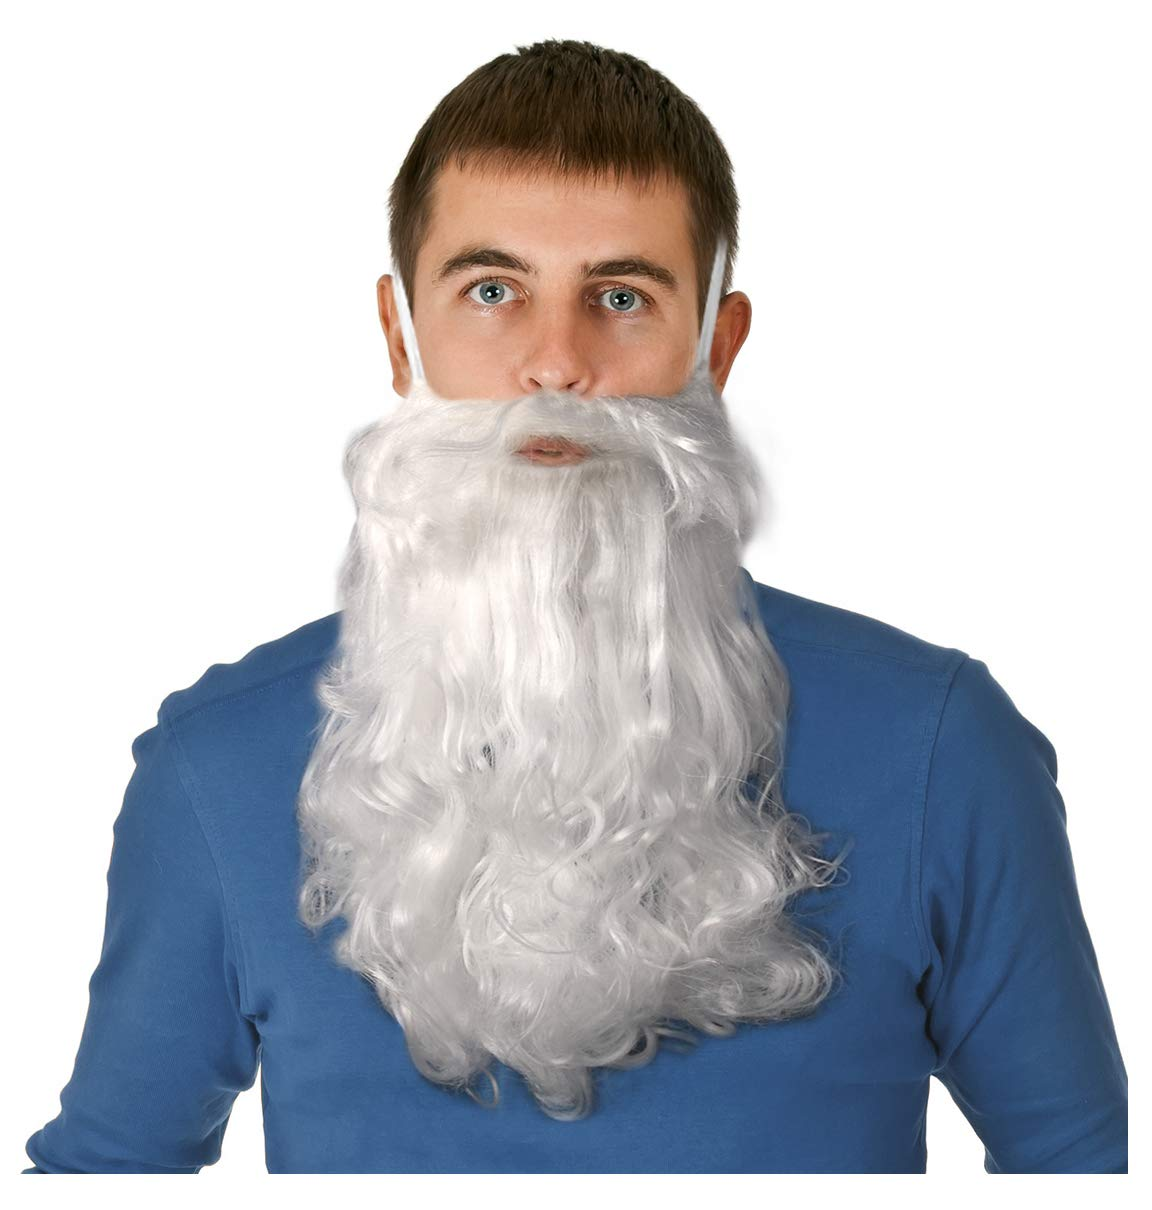 Long White Beard Dwarf Beard Gnome Beard Costume Wizard Beard for Adults or Kids